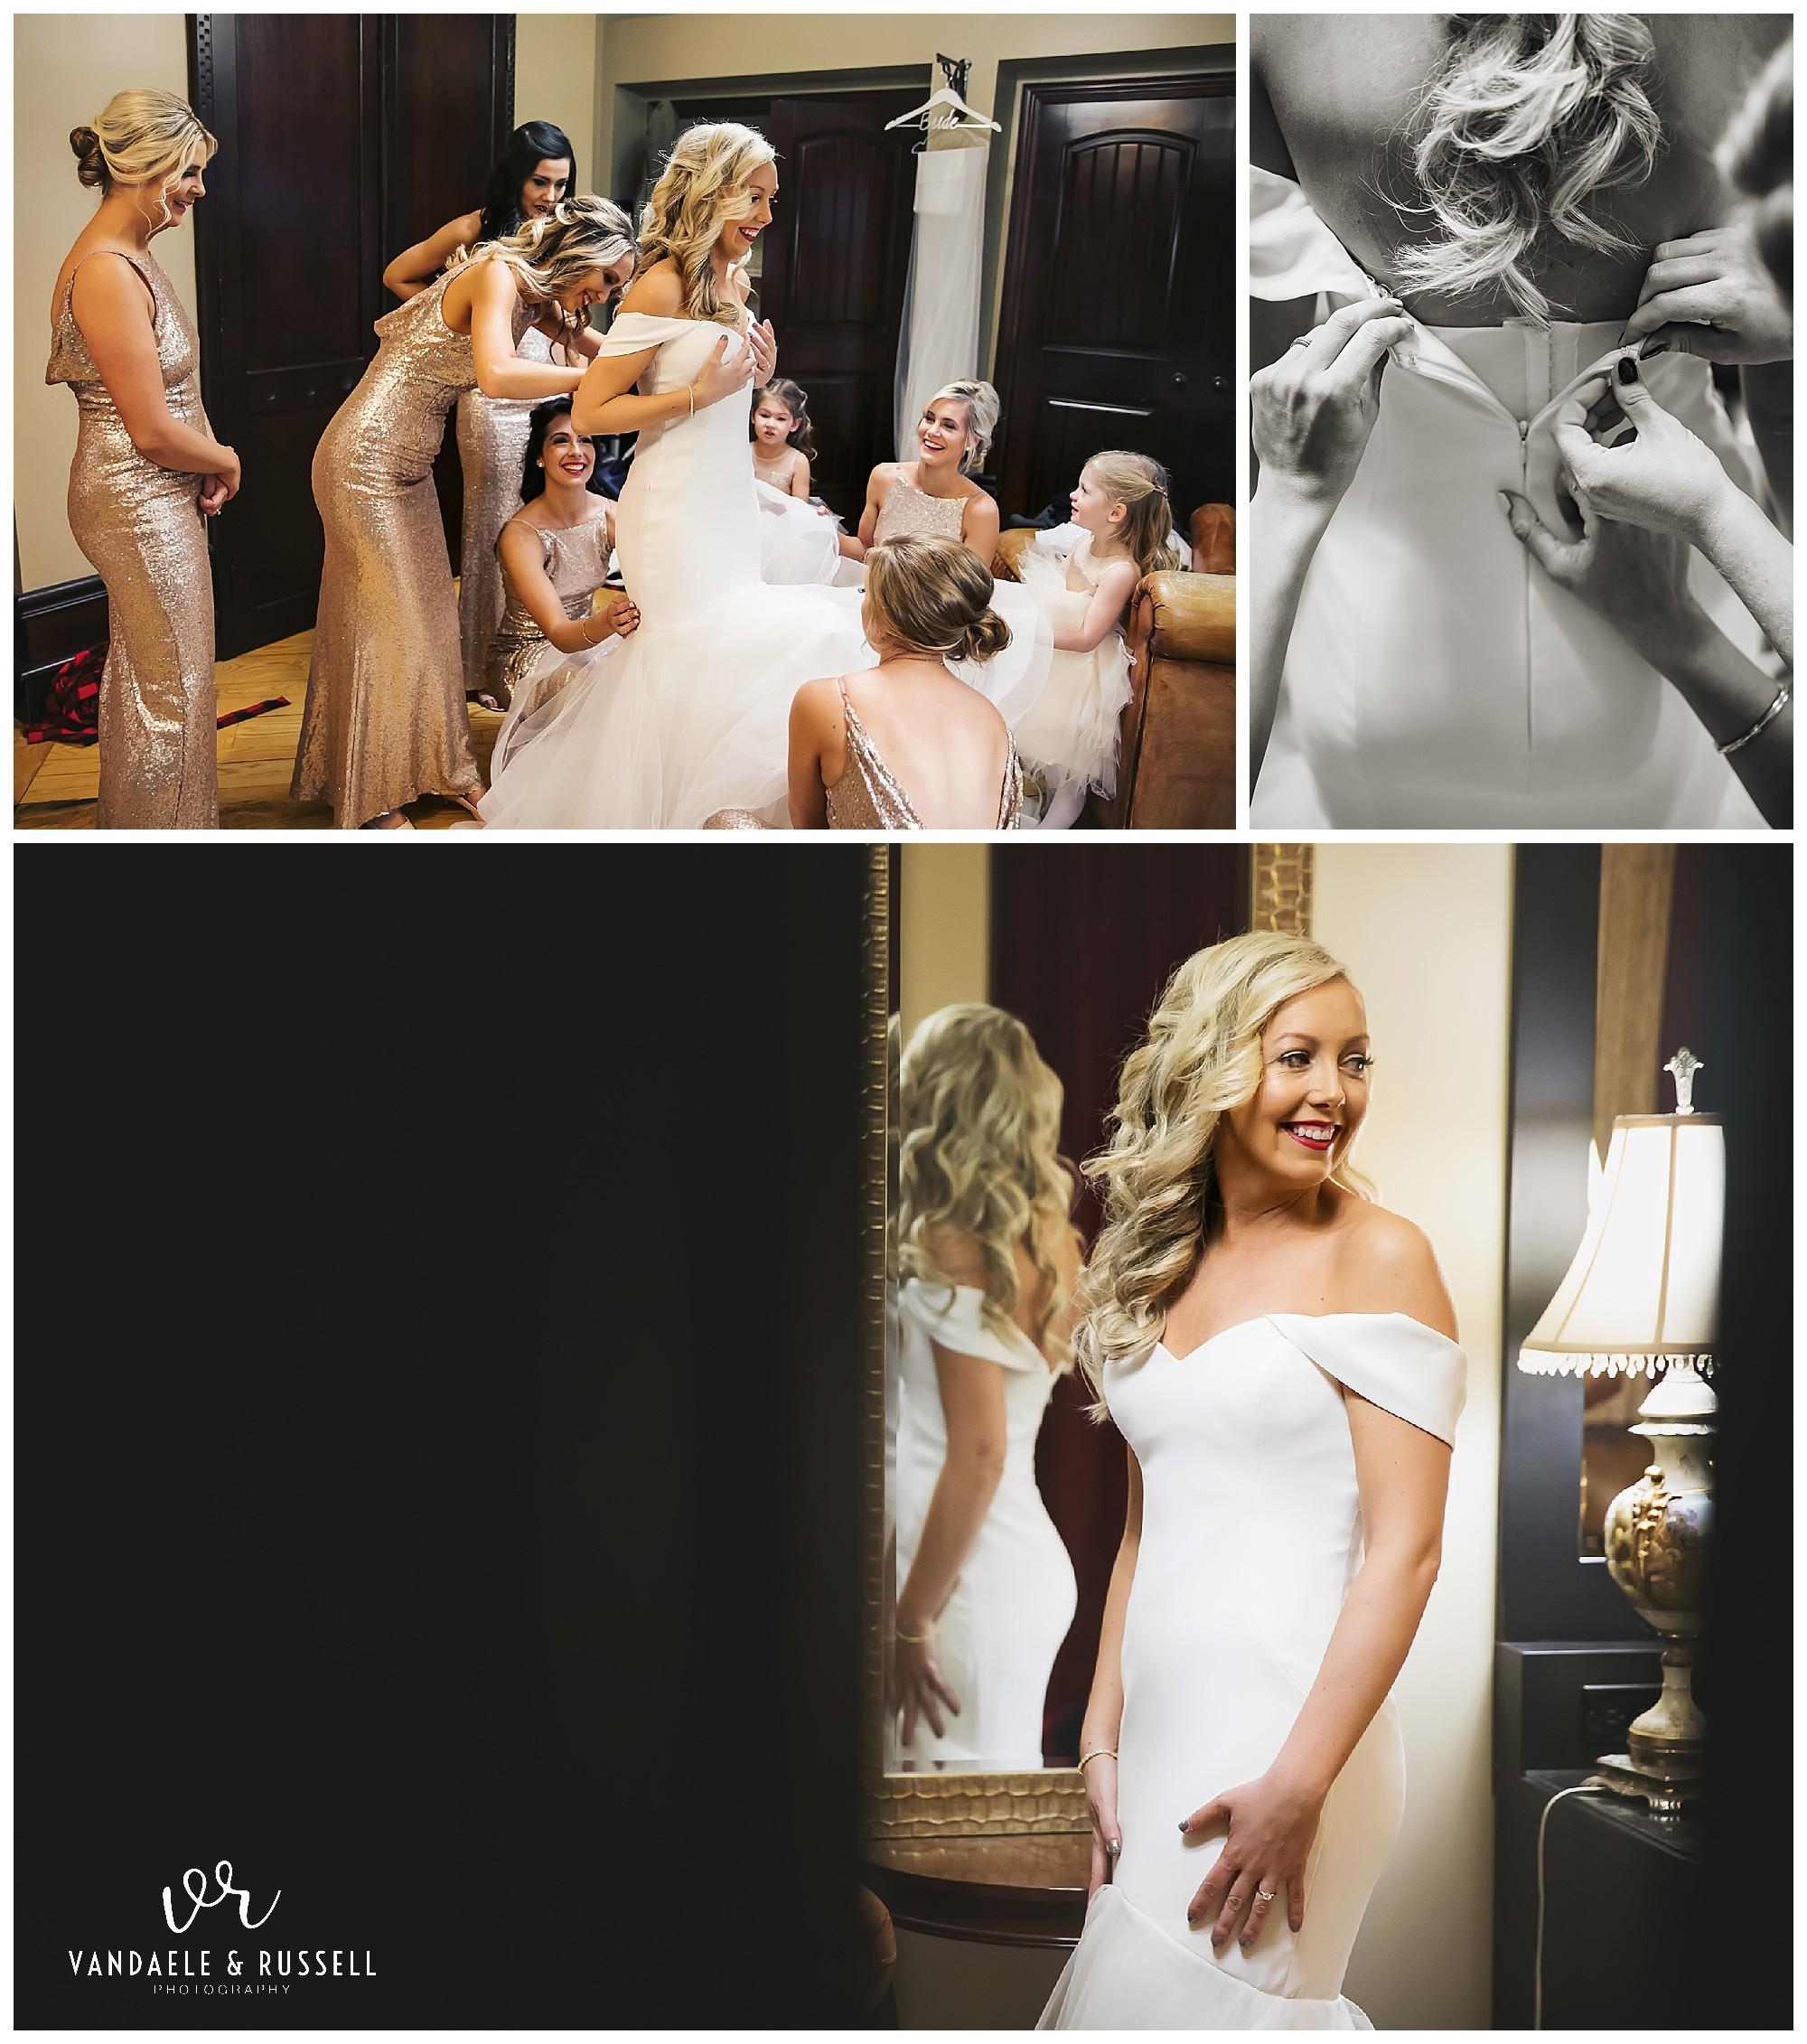 Hacienda-Sarria-Wedding-Photos-NYE-Michelle-Matt-VanDaele-Russell_0006.jpg